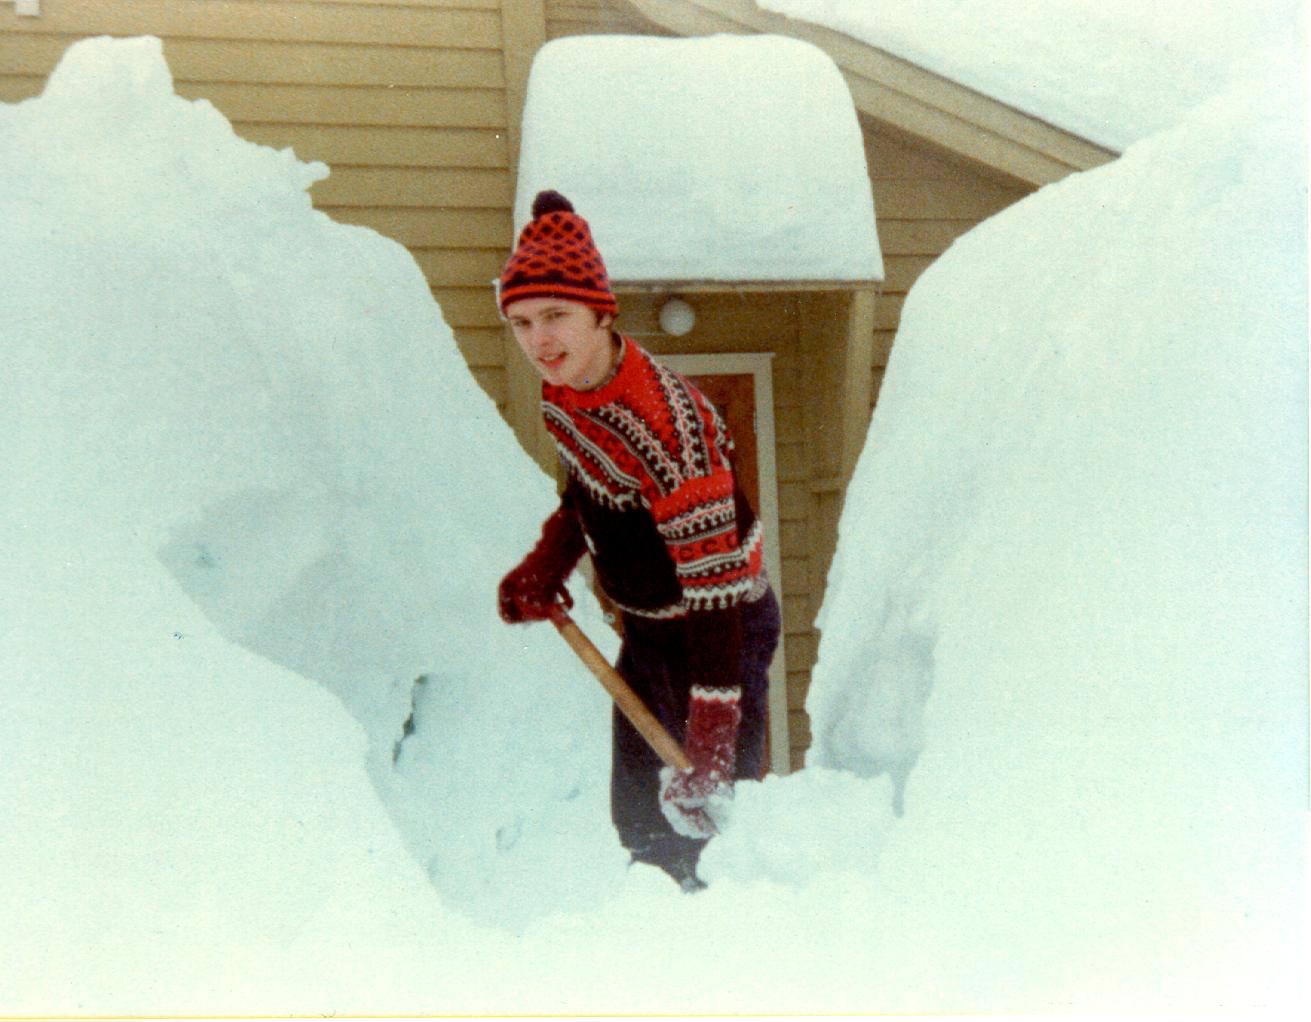 Mykje snø ein typisk vinter i Fjærland.